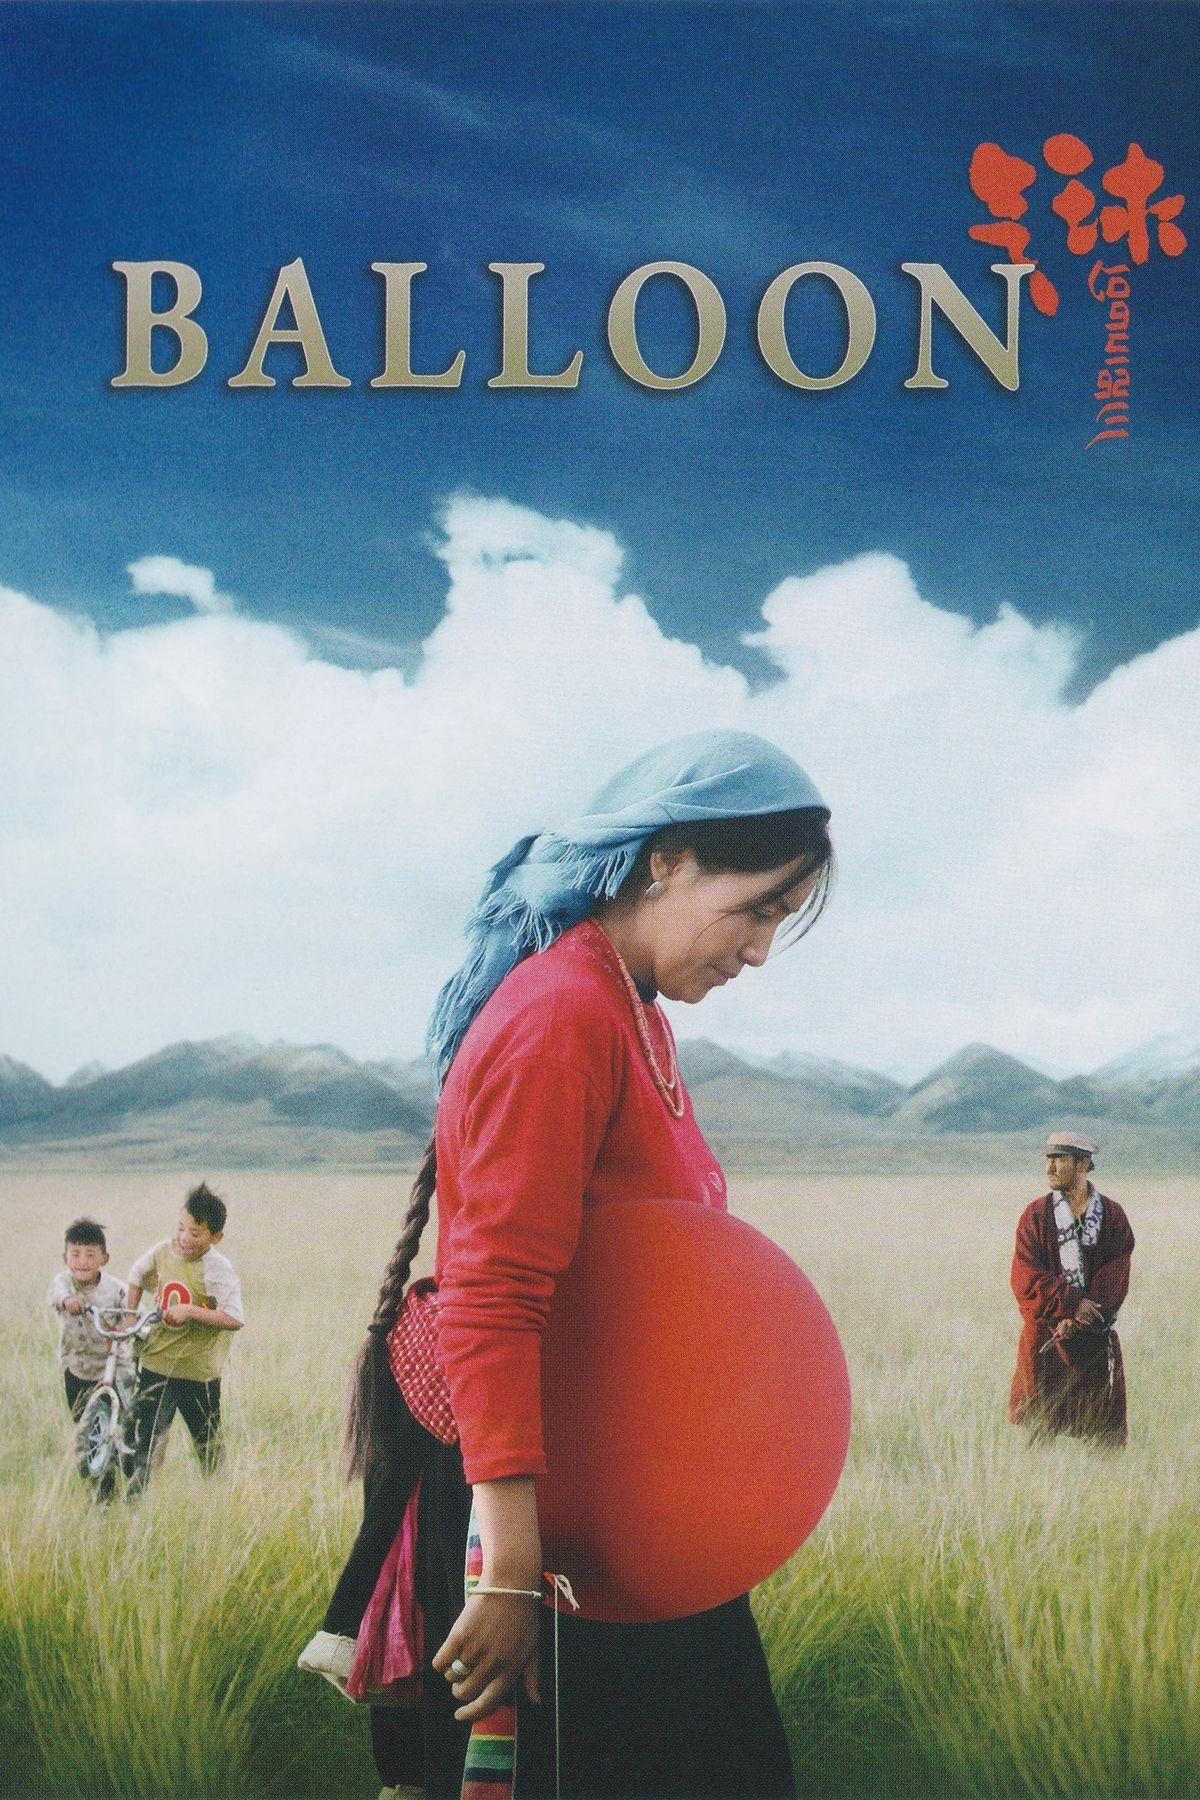 Sonam Wangmo Best Movies, TV Shows and Web Series List